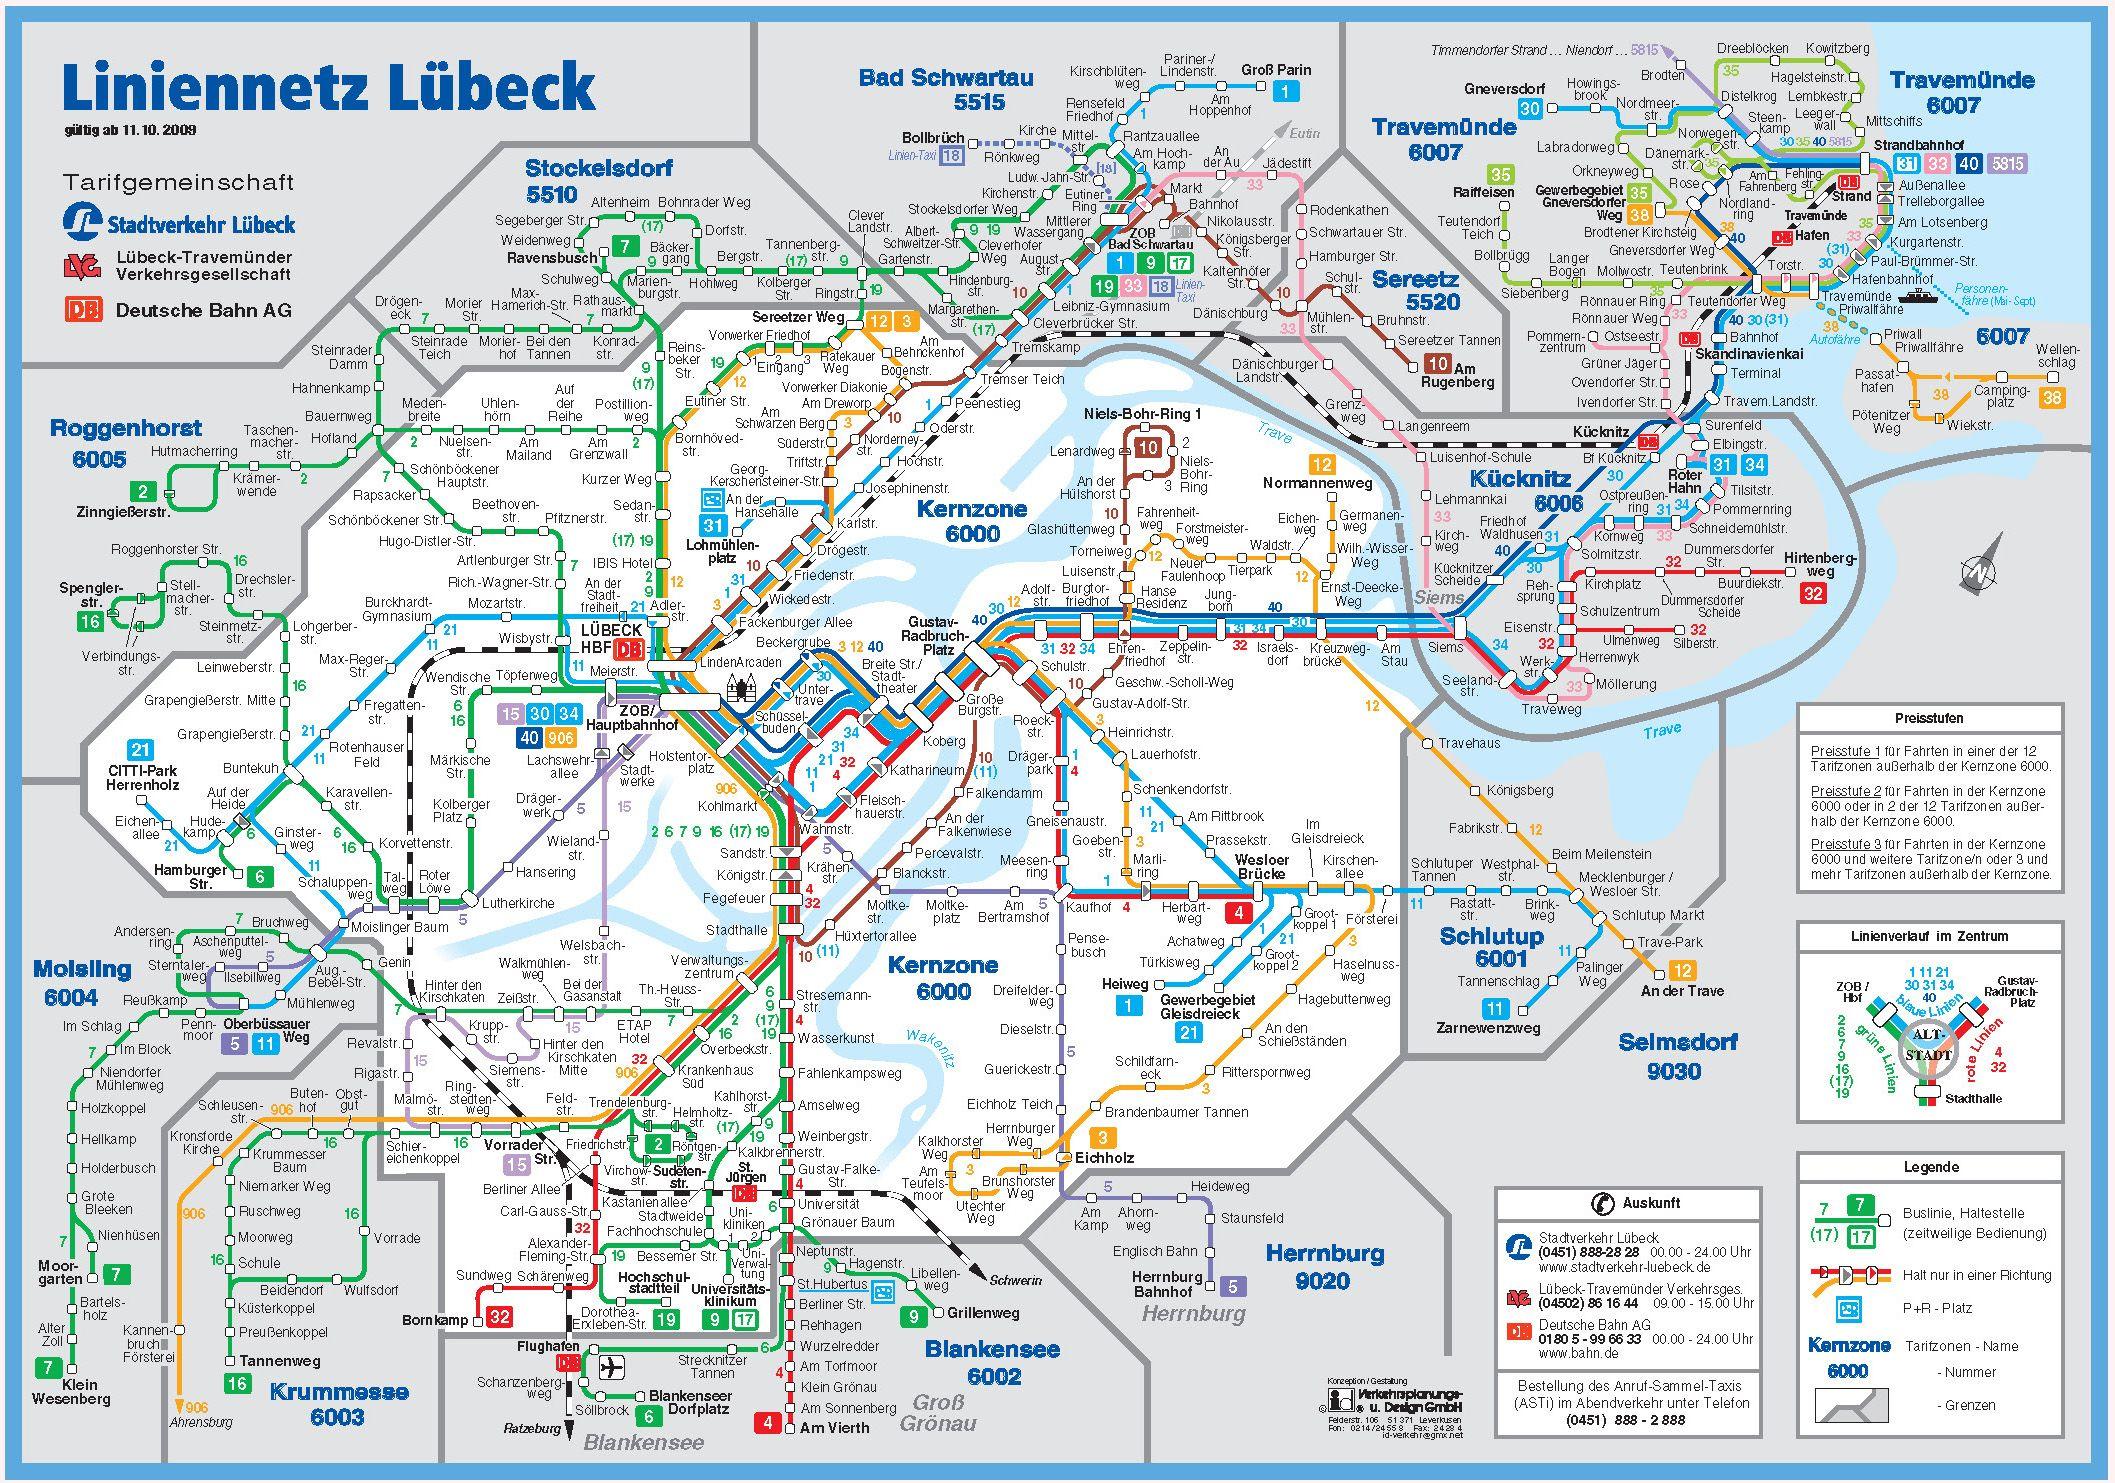 Lbeck MetroTrains Pinterest Rapid transit and Subway map